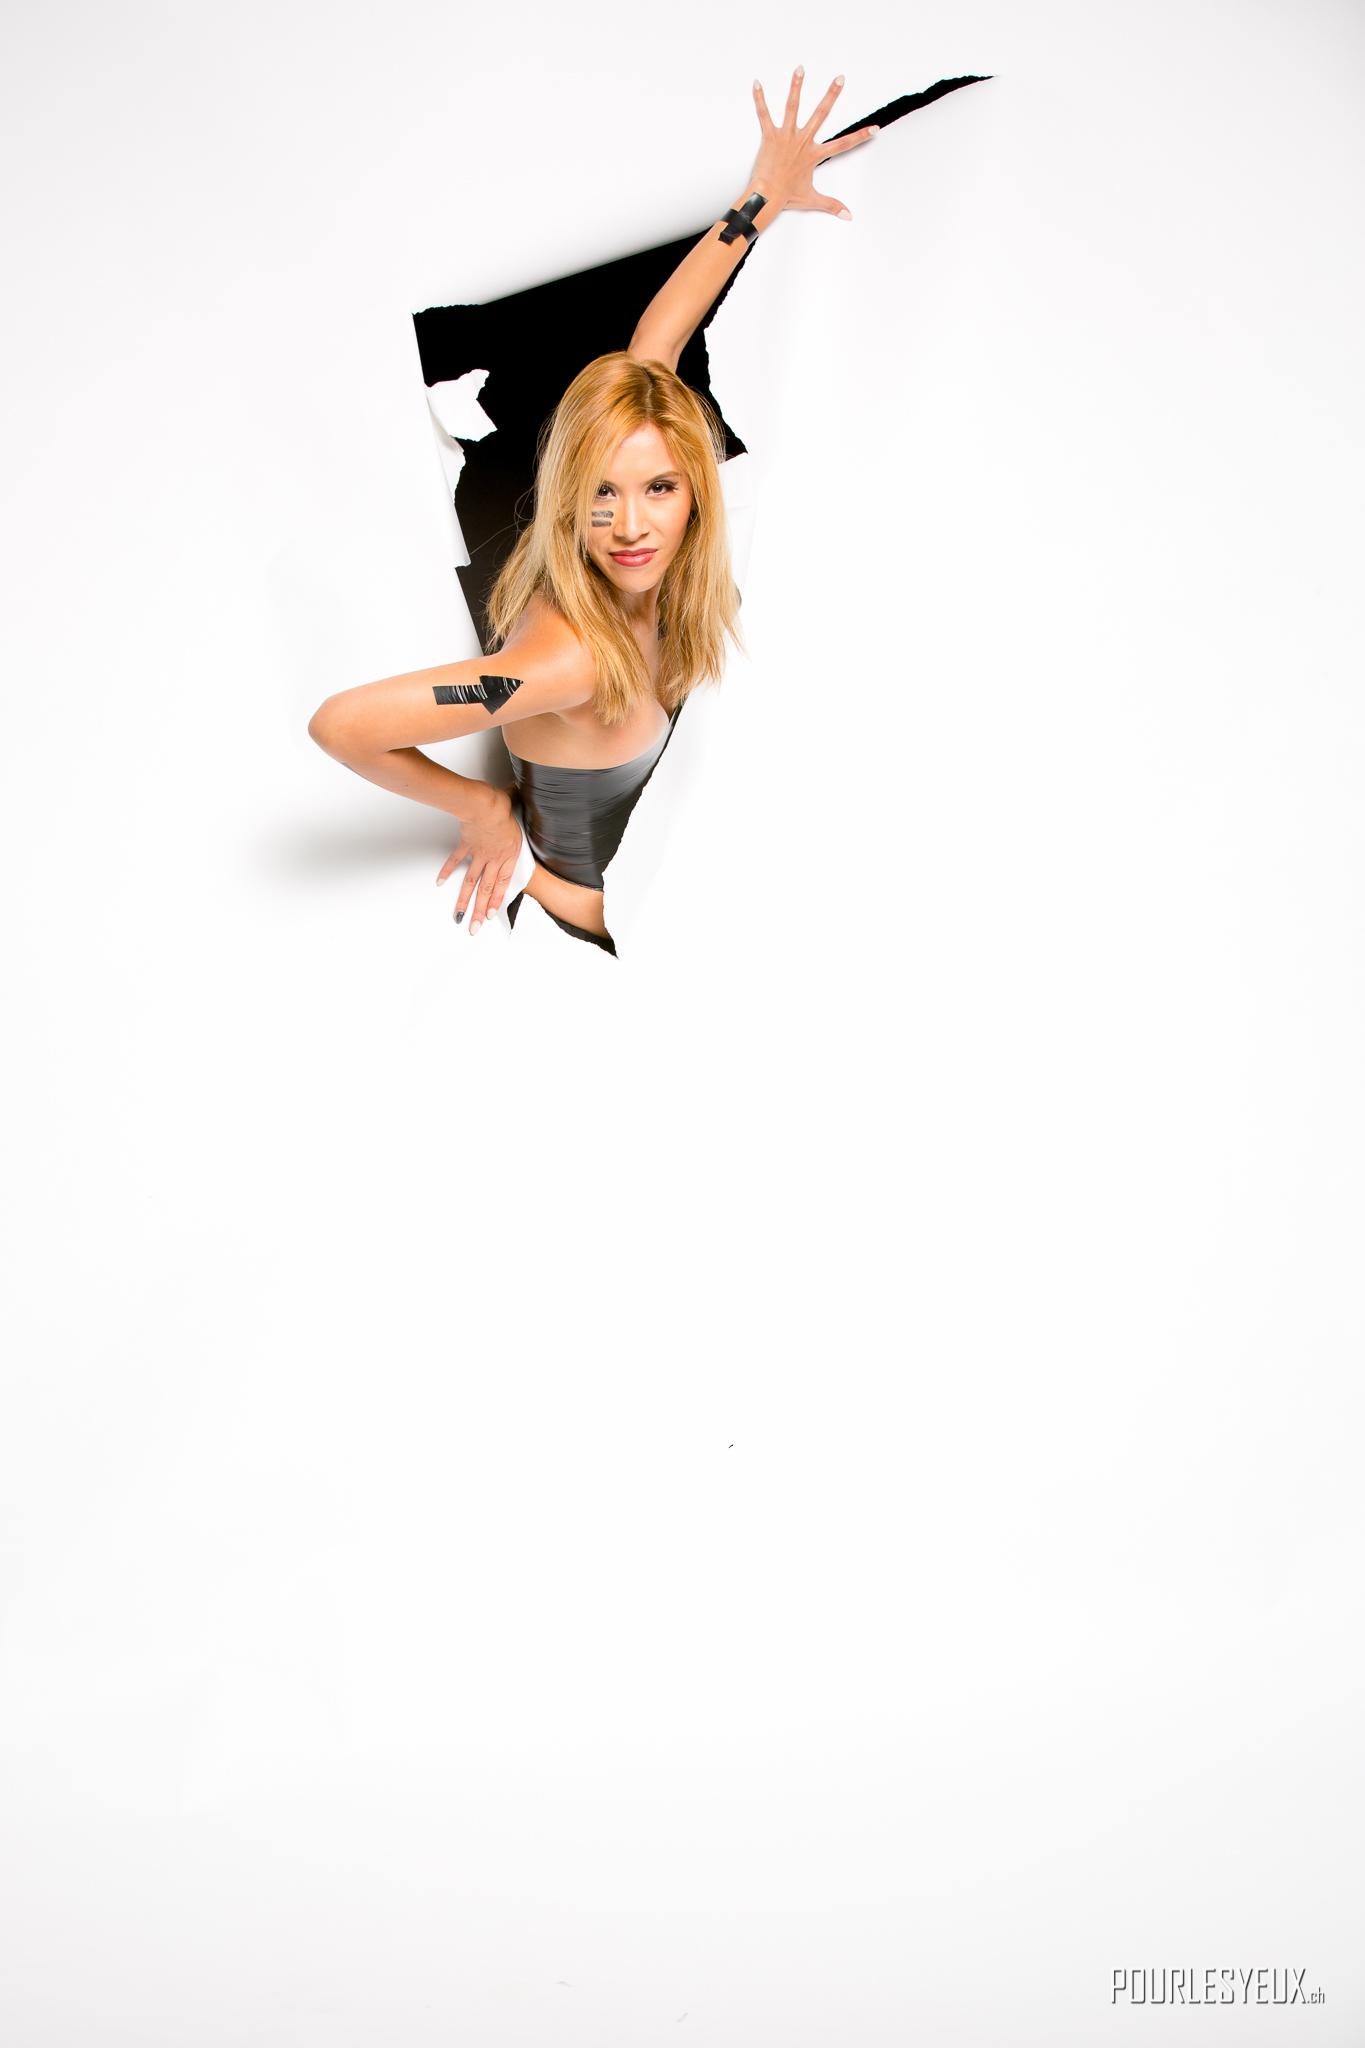 photographe geneve theme dechire